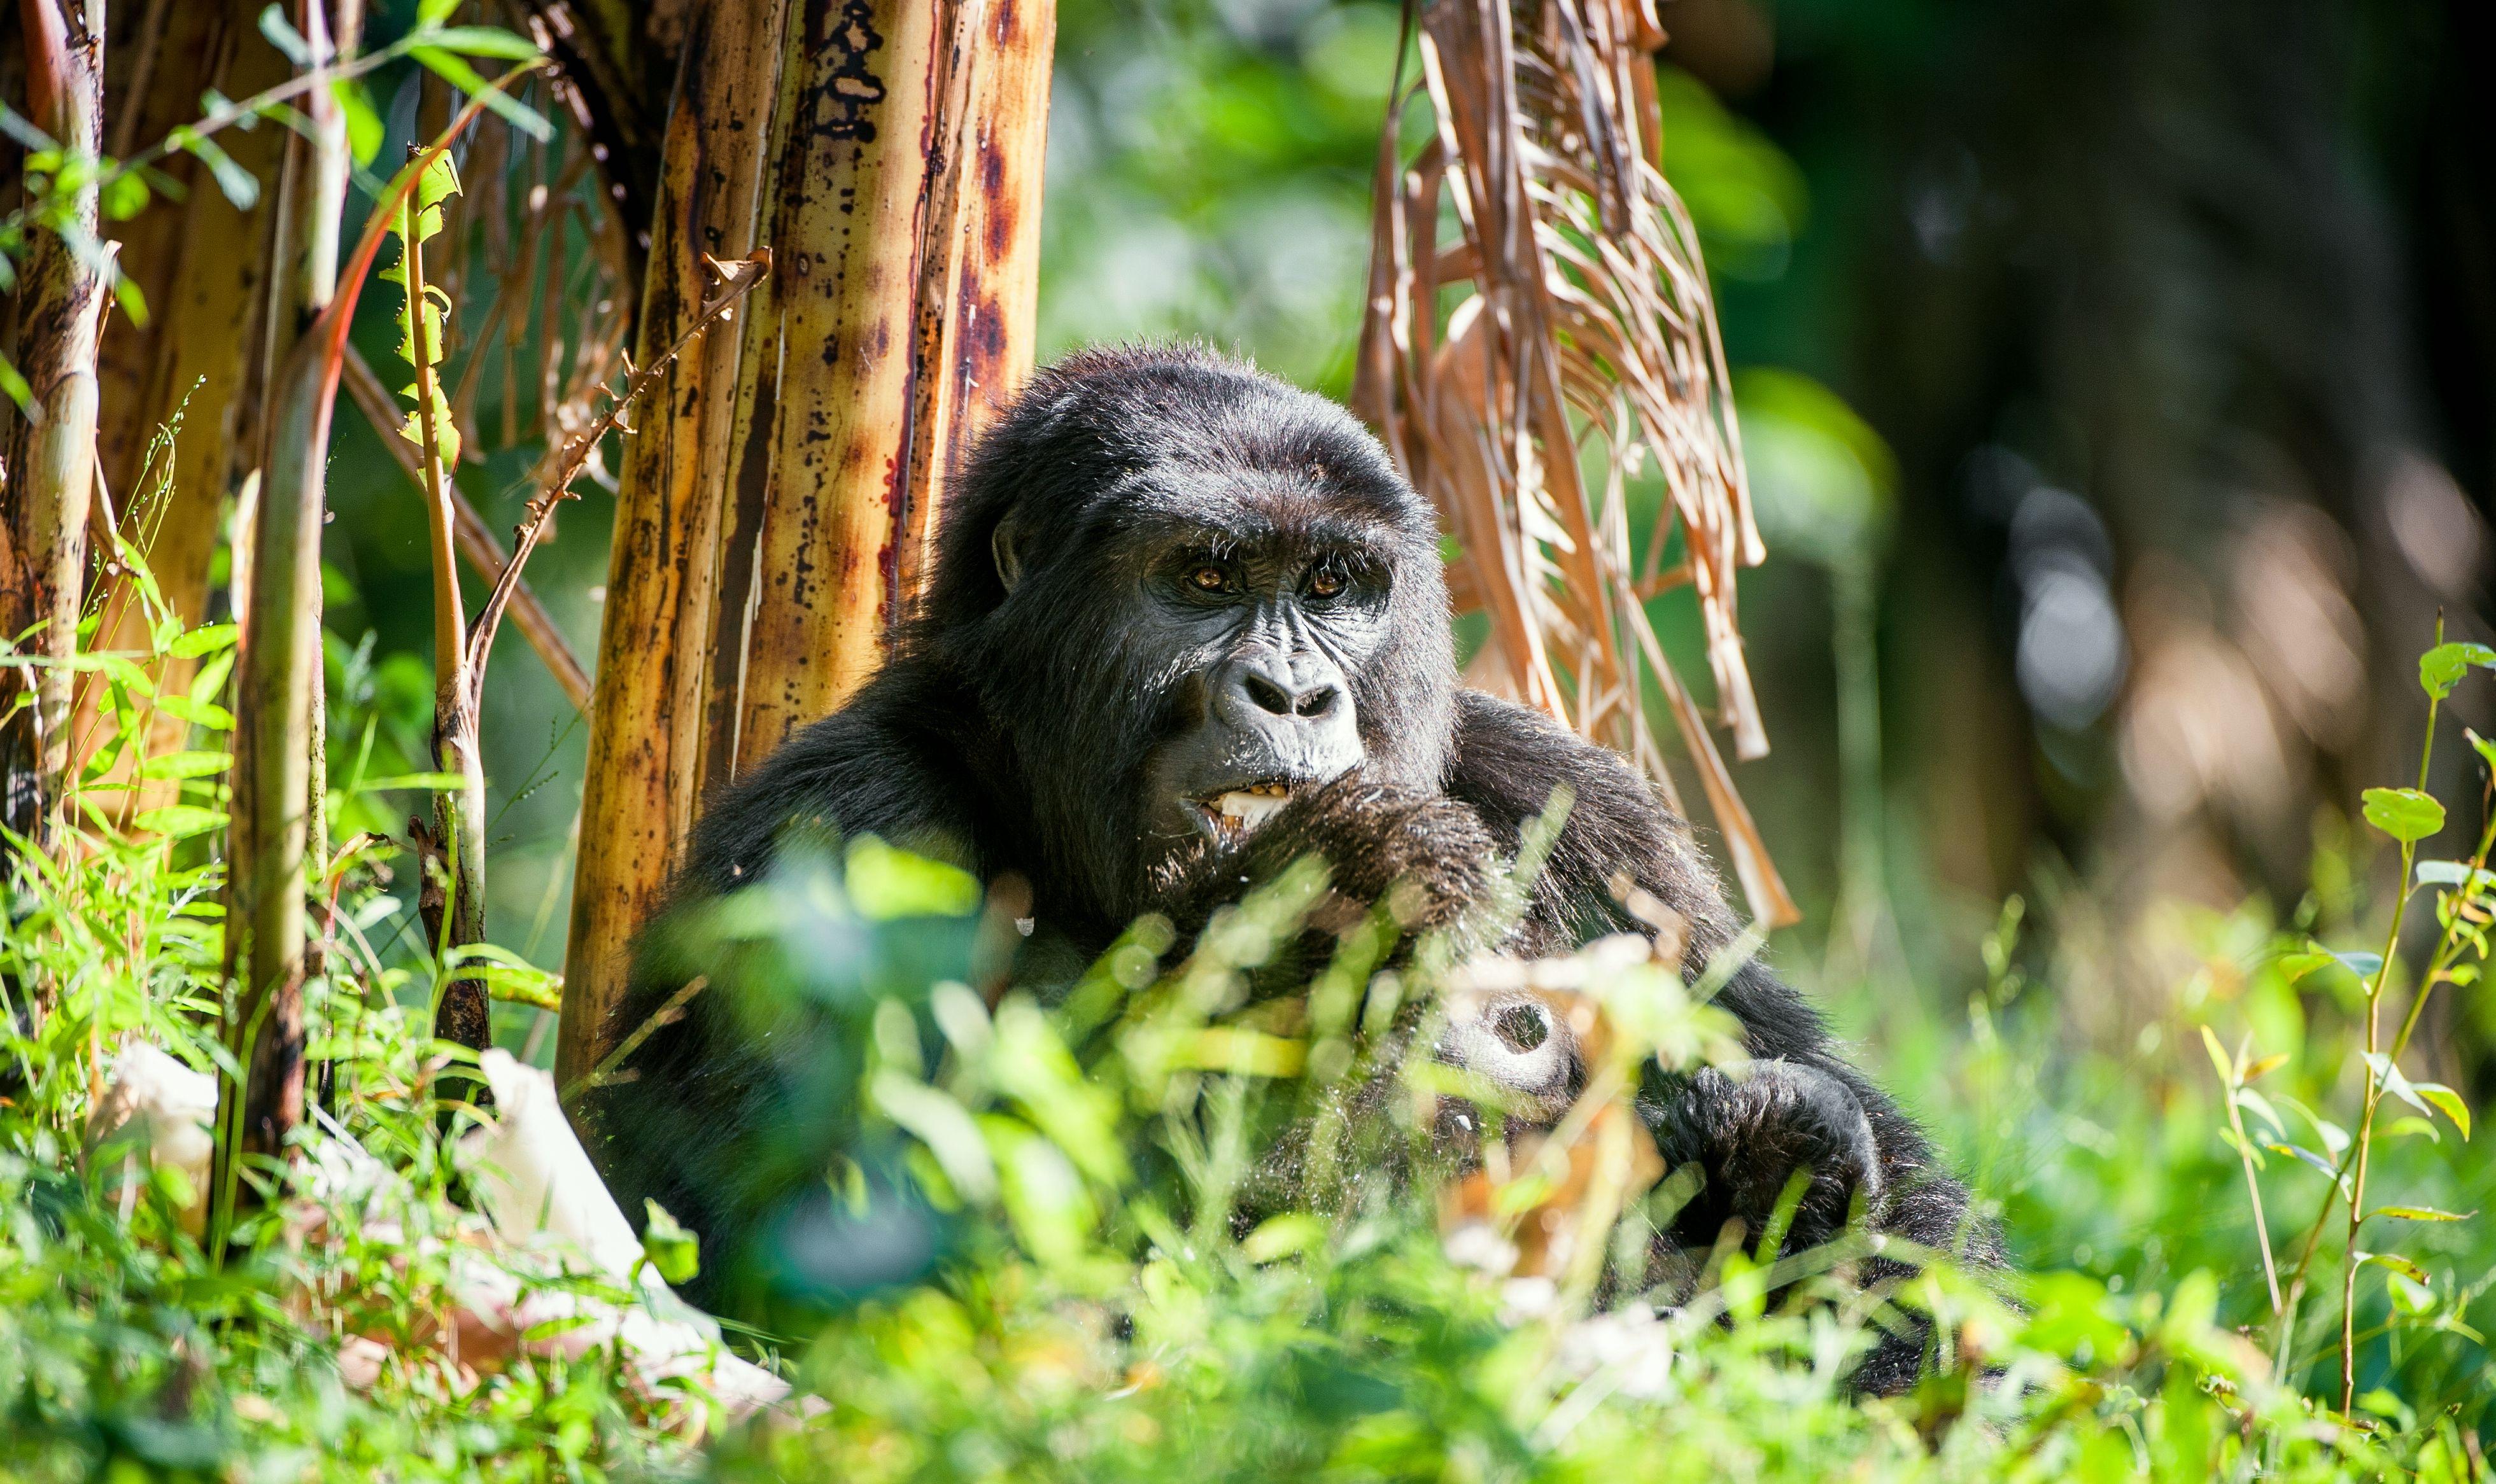 Portrait of a mountain gorilla